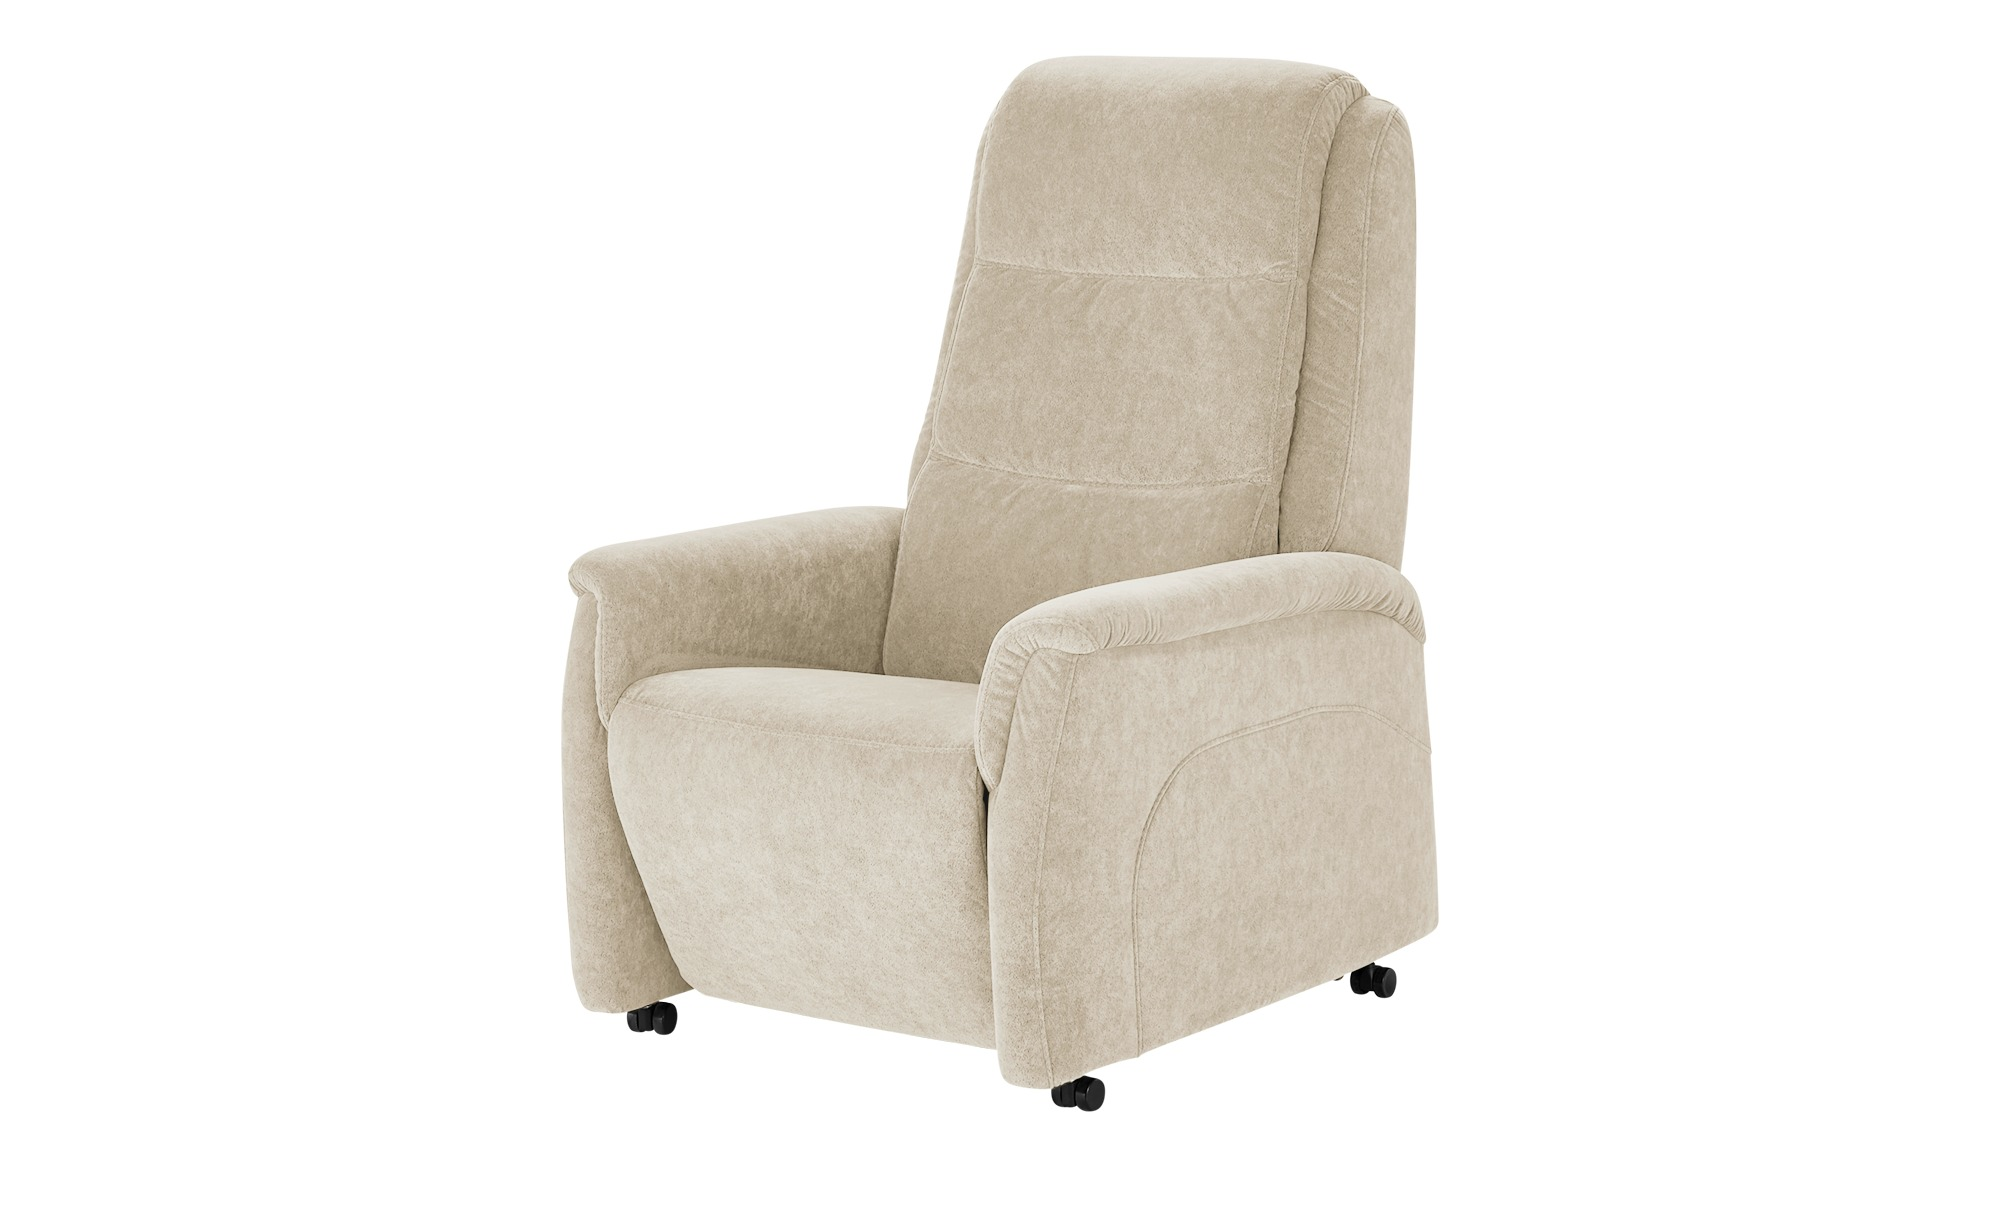 Hukla Fernsehsessel  Dean ¦ creme ¦ Maße (cm): B: 70 H: 105 T: 88 Polstermöbel > Sessel > Fernsehsessel - Höffner